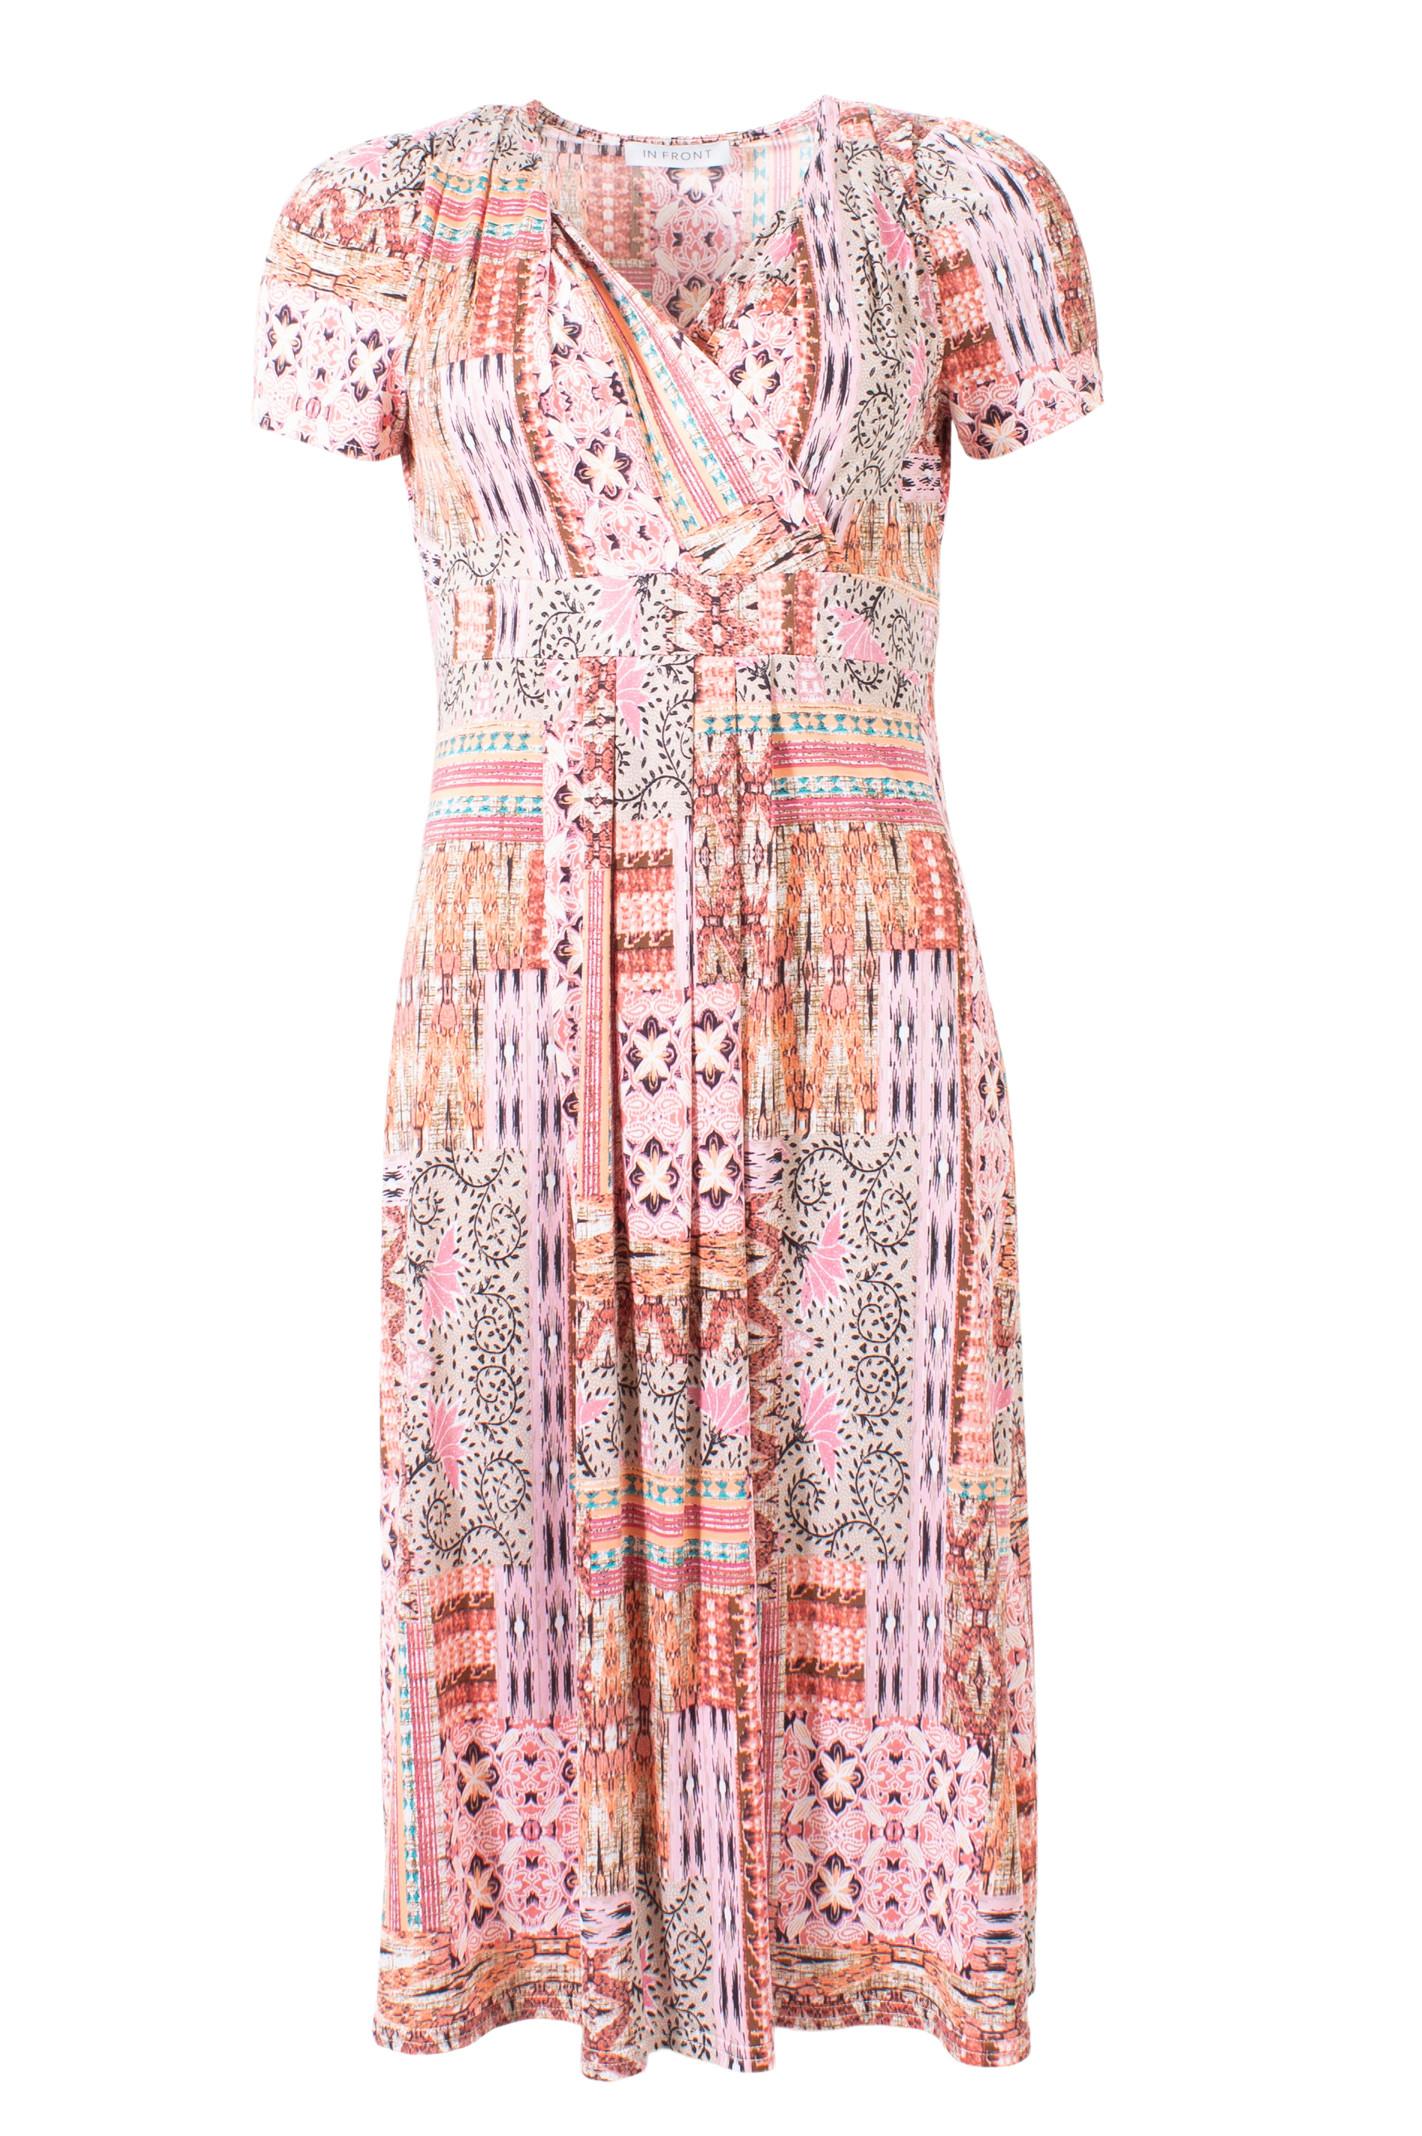 IN FRONT Eternity dress short 13920 Rose